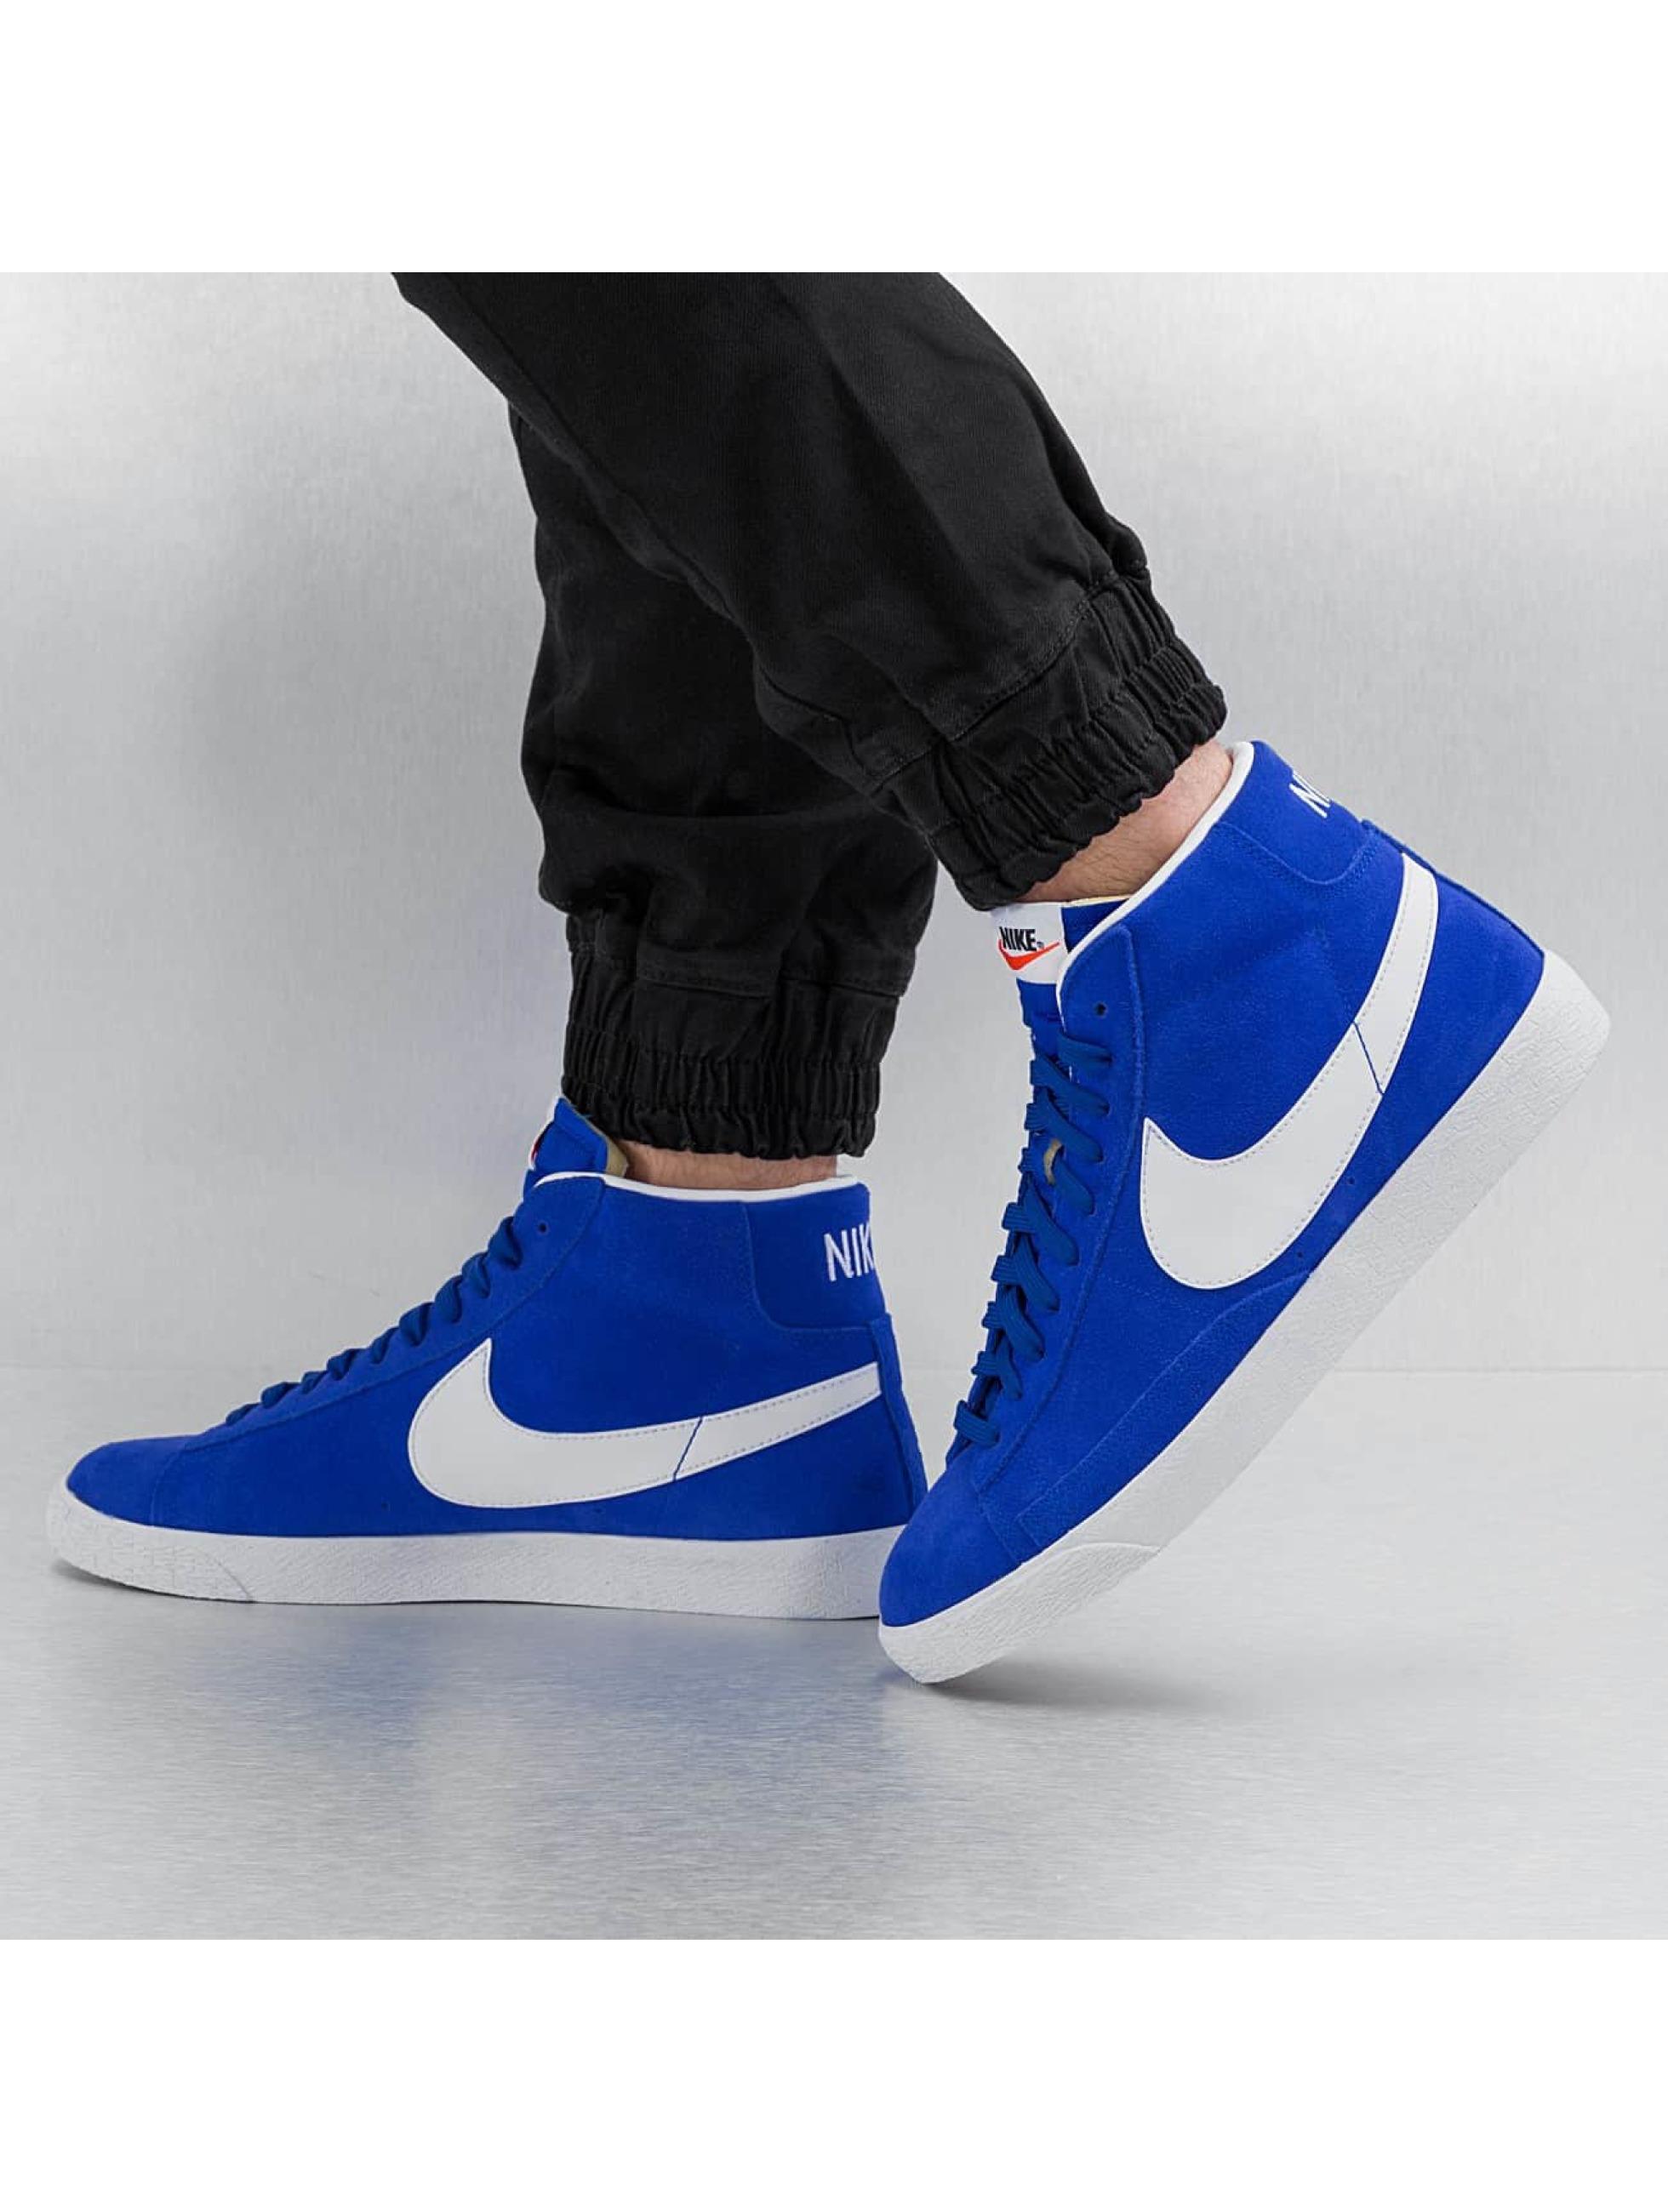 Sneaker Blazer Mid-Top Premium in blau